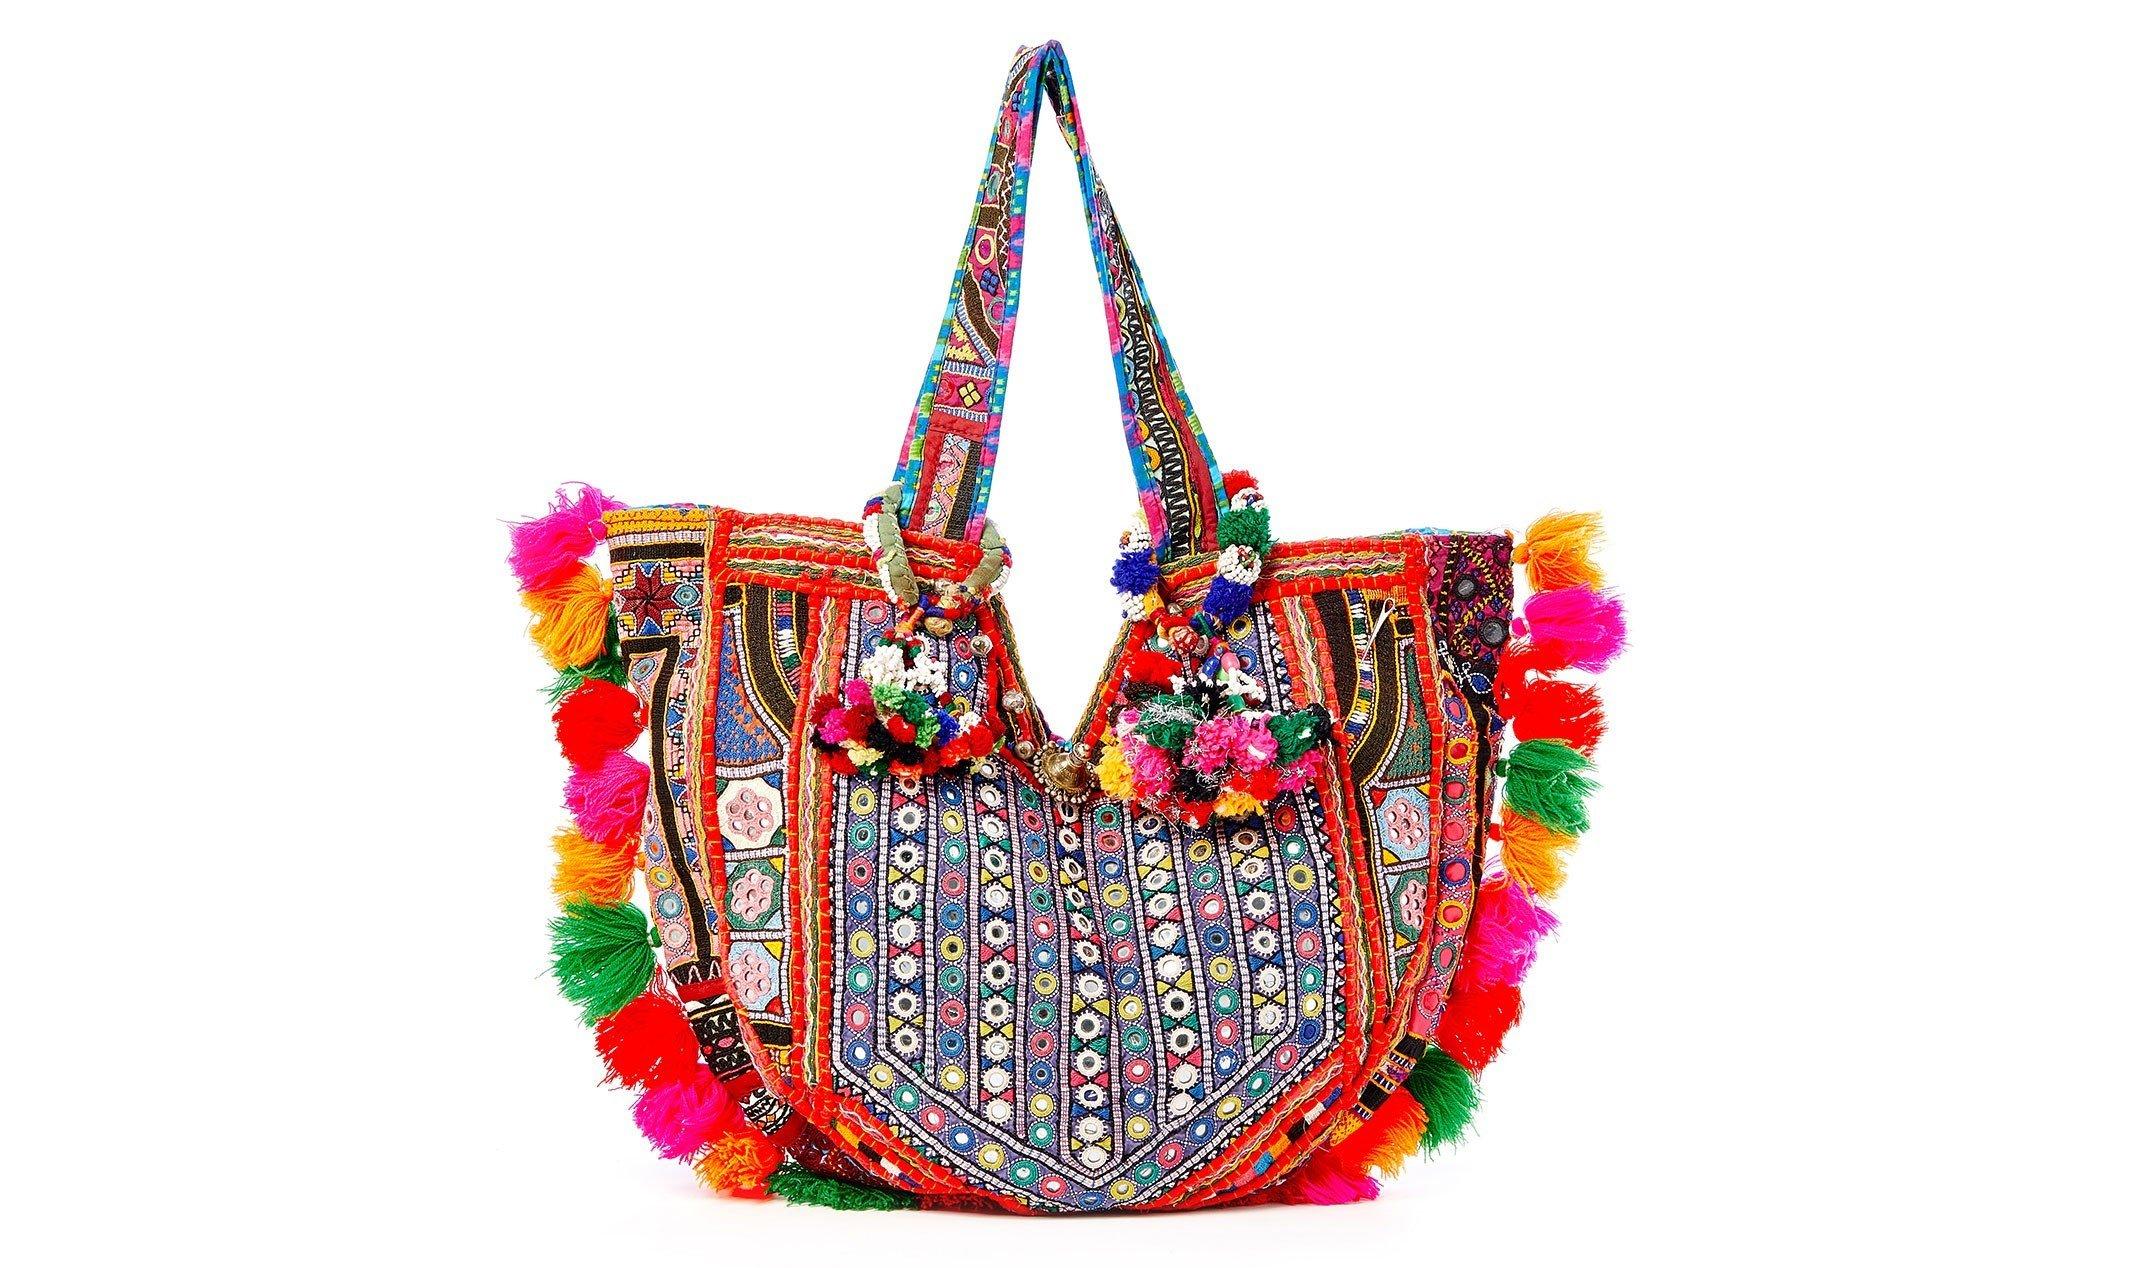 Style + Design bag colorful handbag product fashion accessory art colored magenta accessory